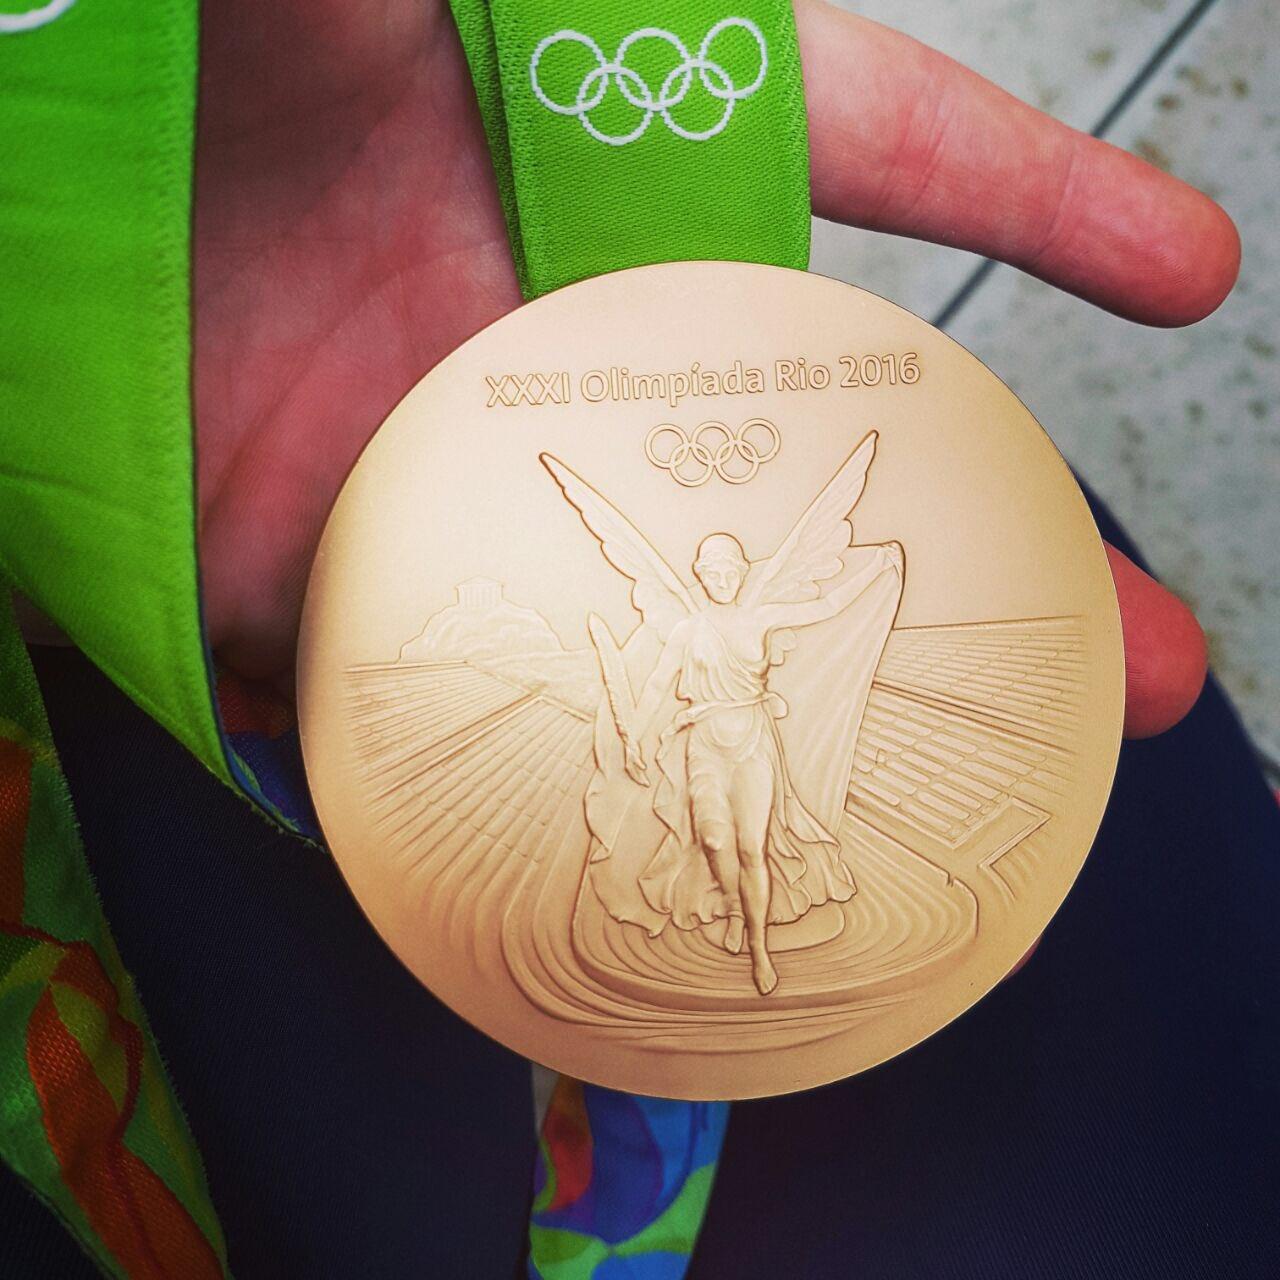 Crista Cullen's Gold Medal